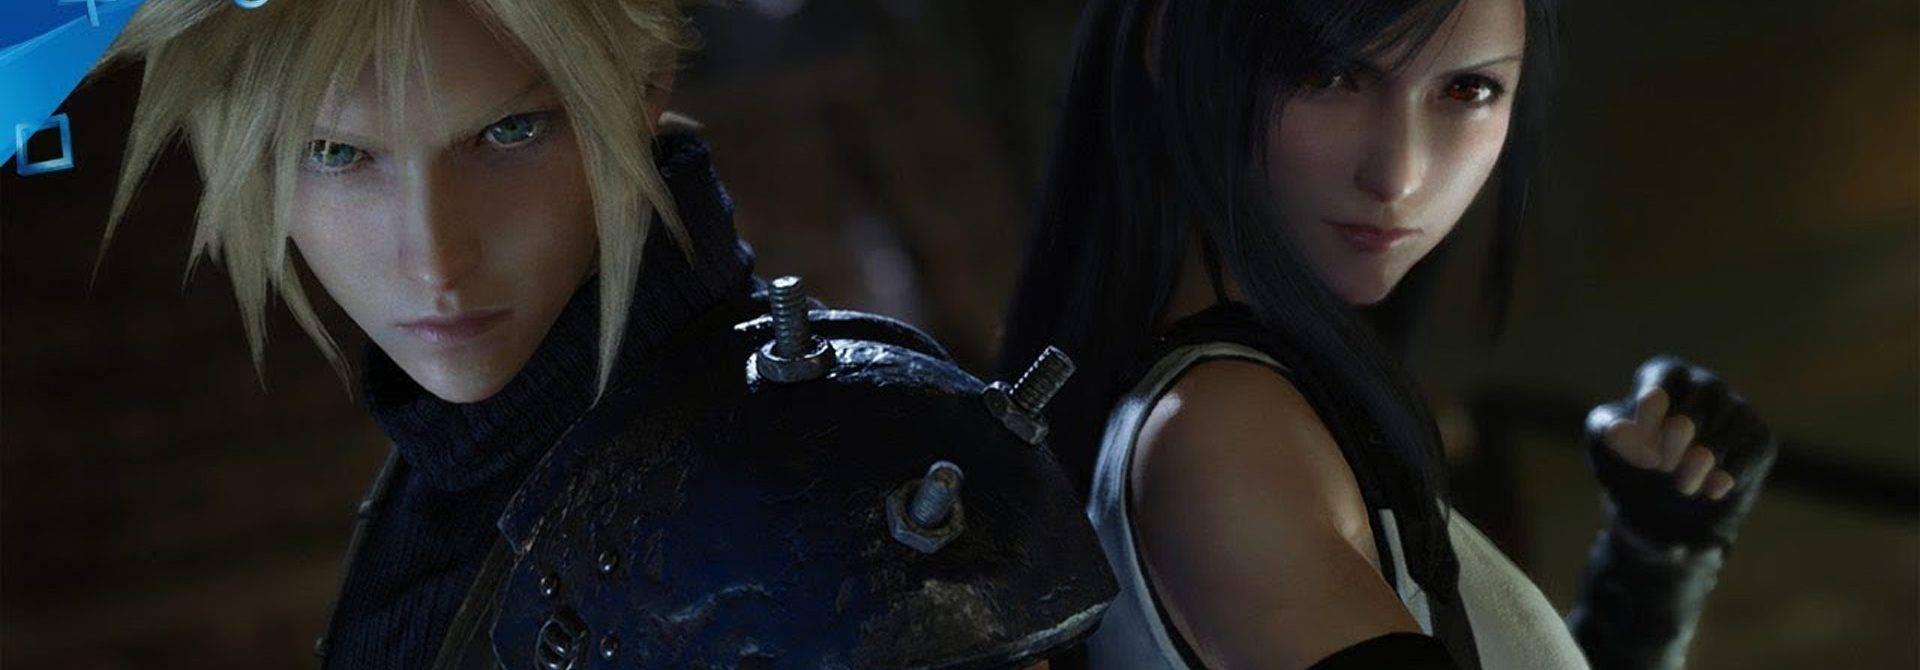 Square Presents: Inside Final Fantasy 7 Remake